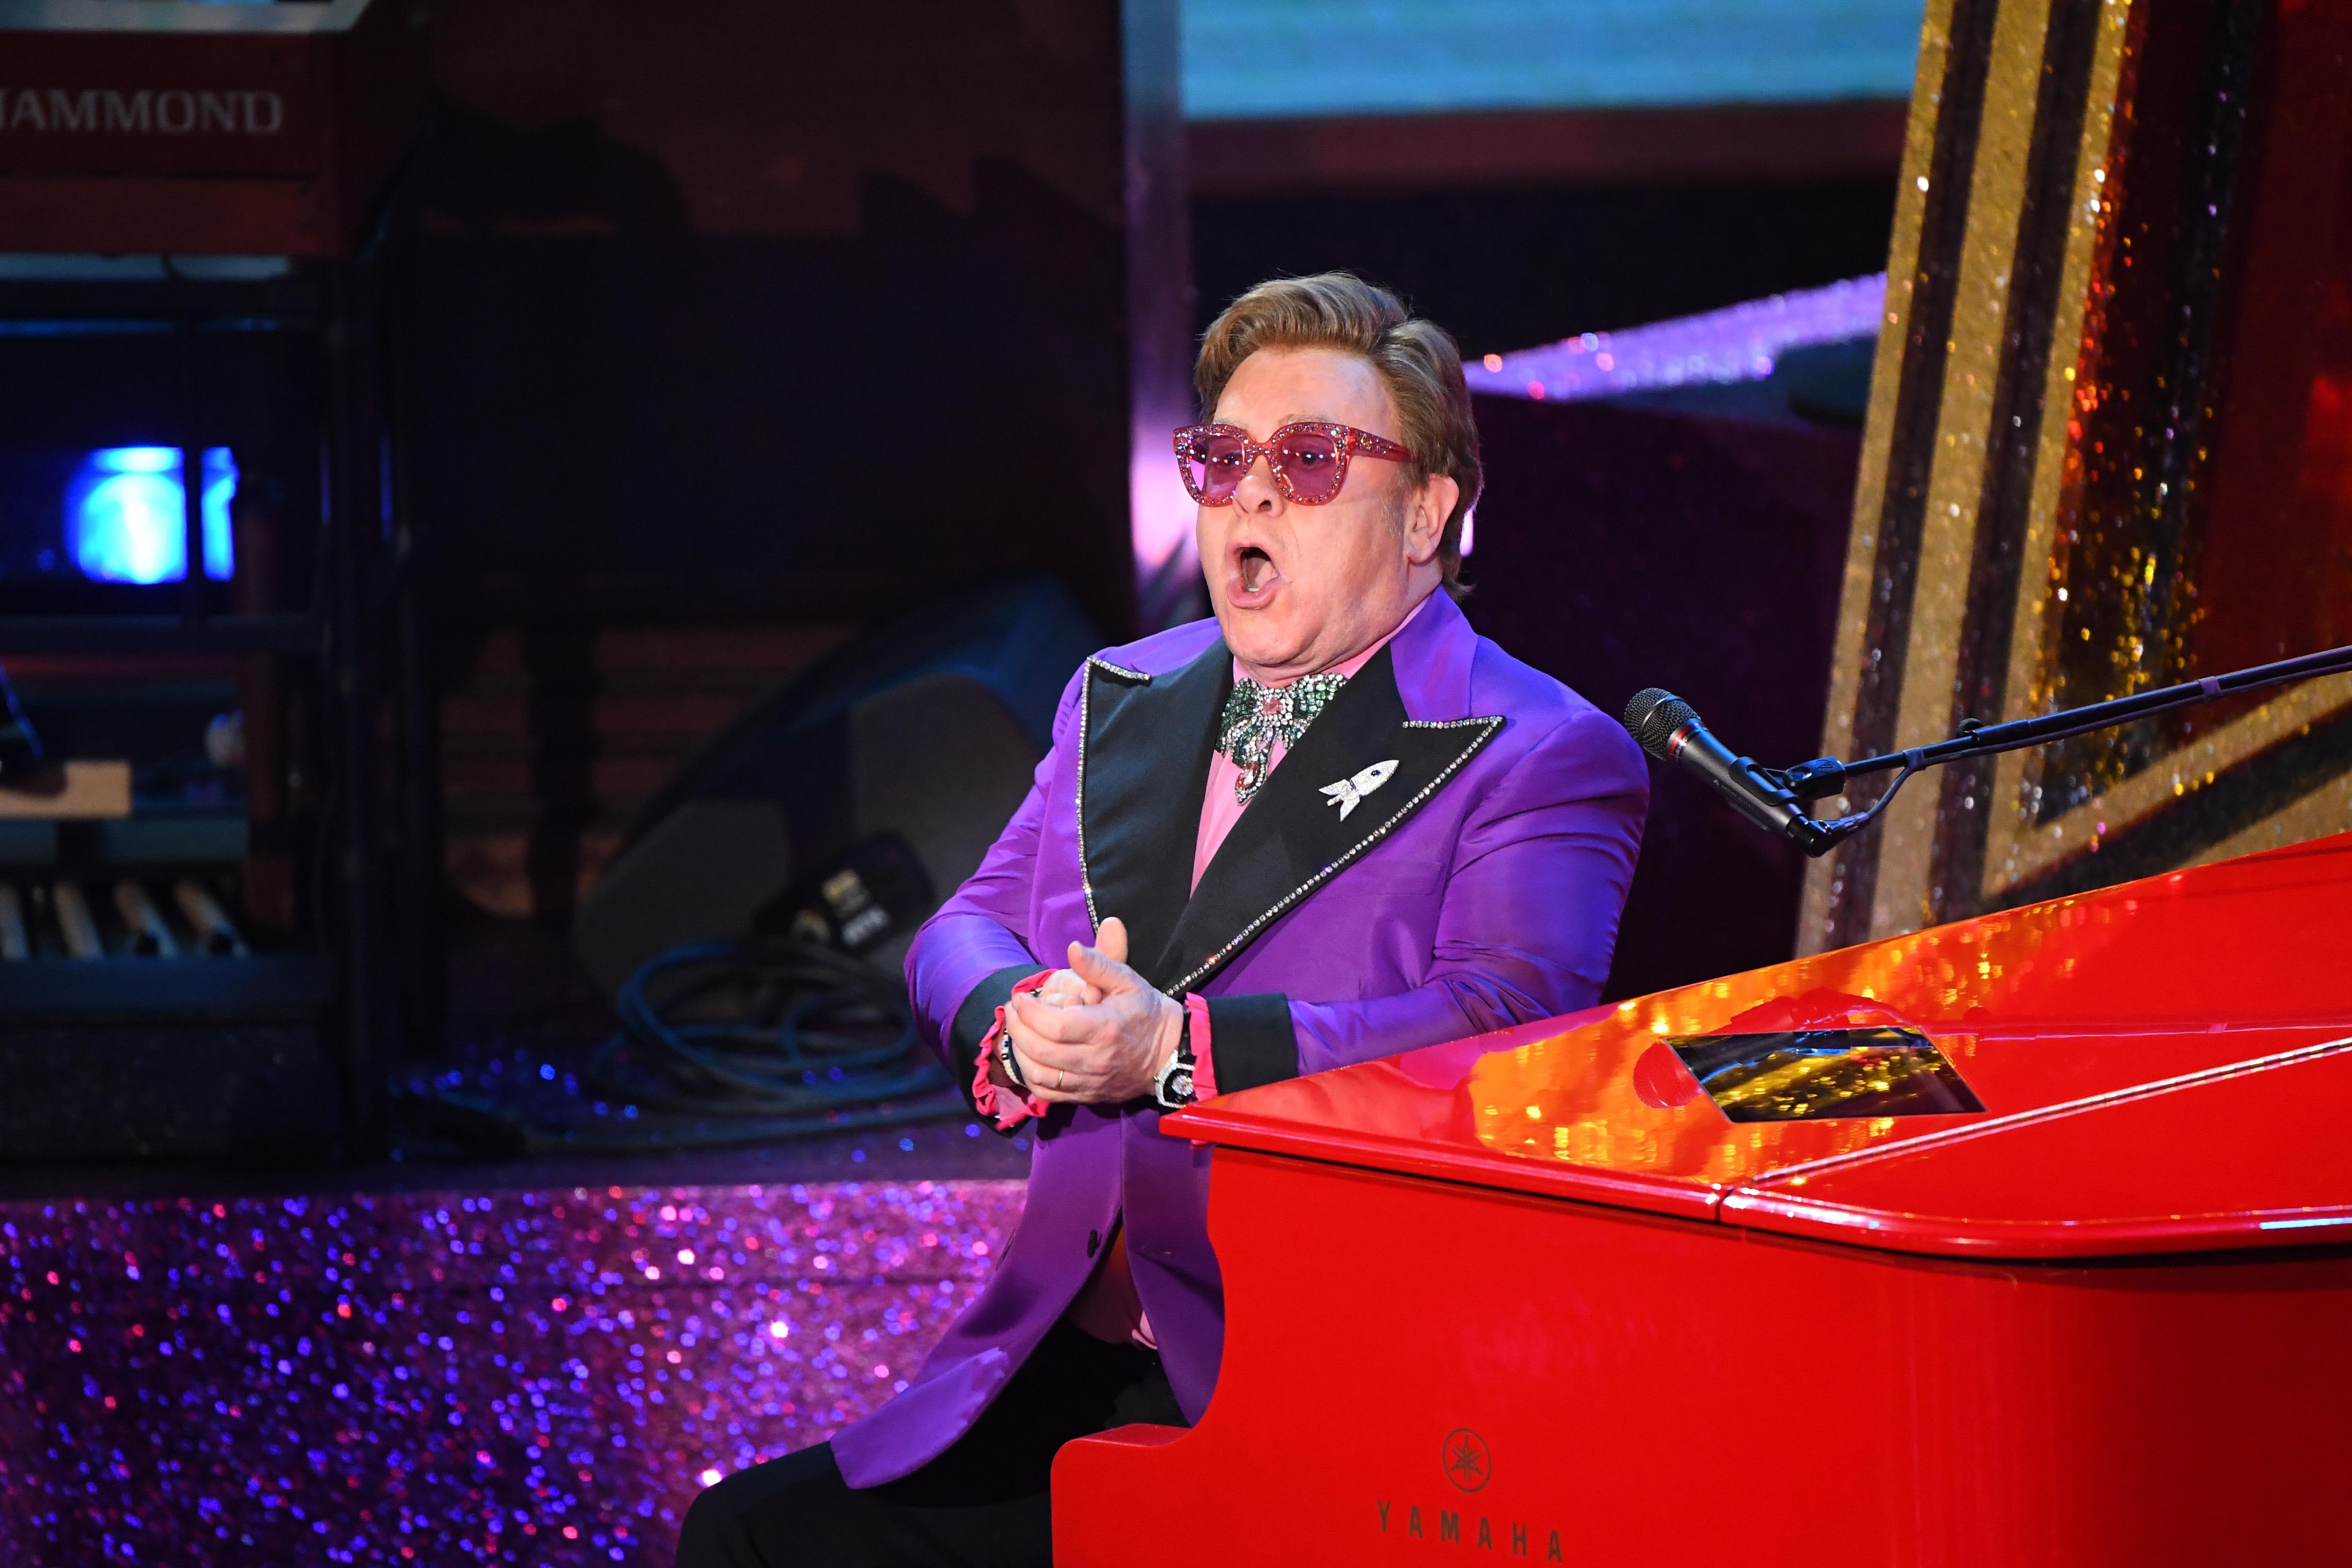 Elton John cancels last two New Zealand shows as he battles pneumonia